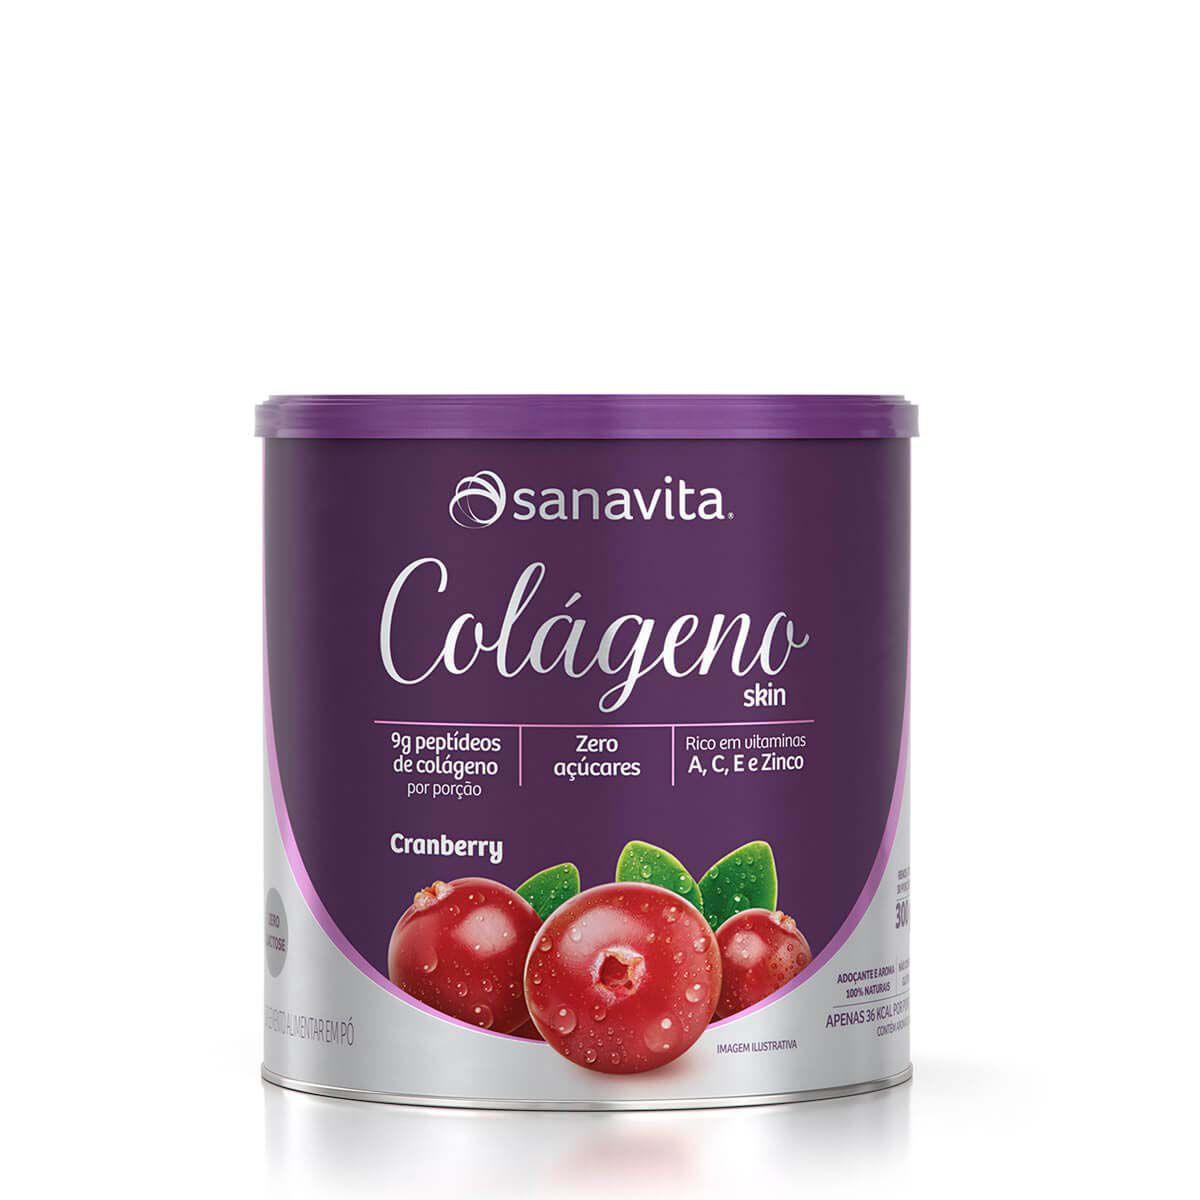 Colágeno Skin 300g Cranberry Sanavita